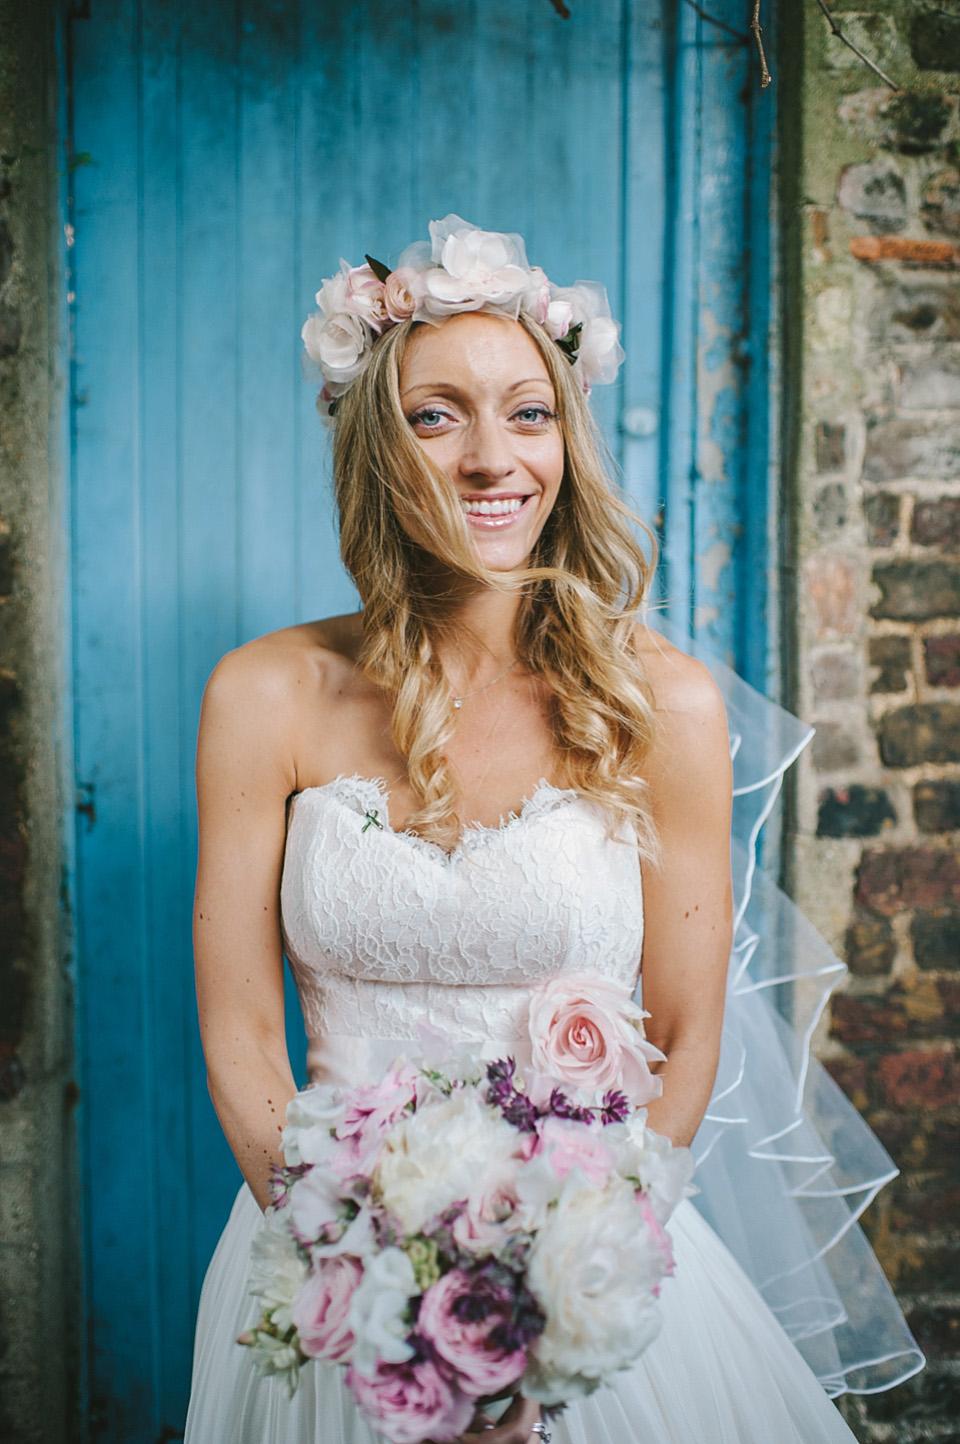 An Elegant Naomi Neoh Gown For Summertime, Riverside Wedding in ...